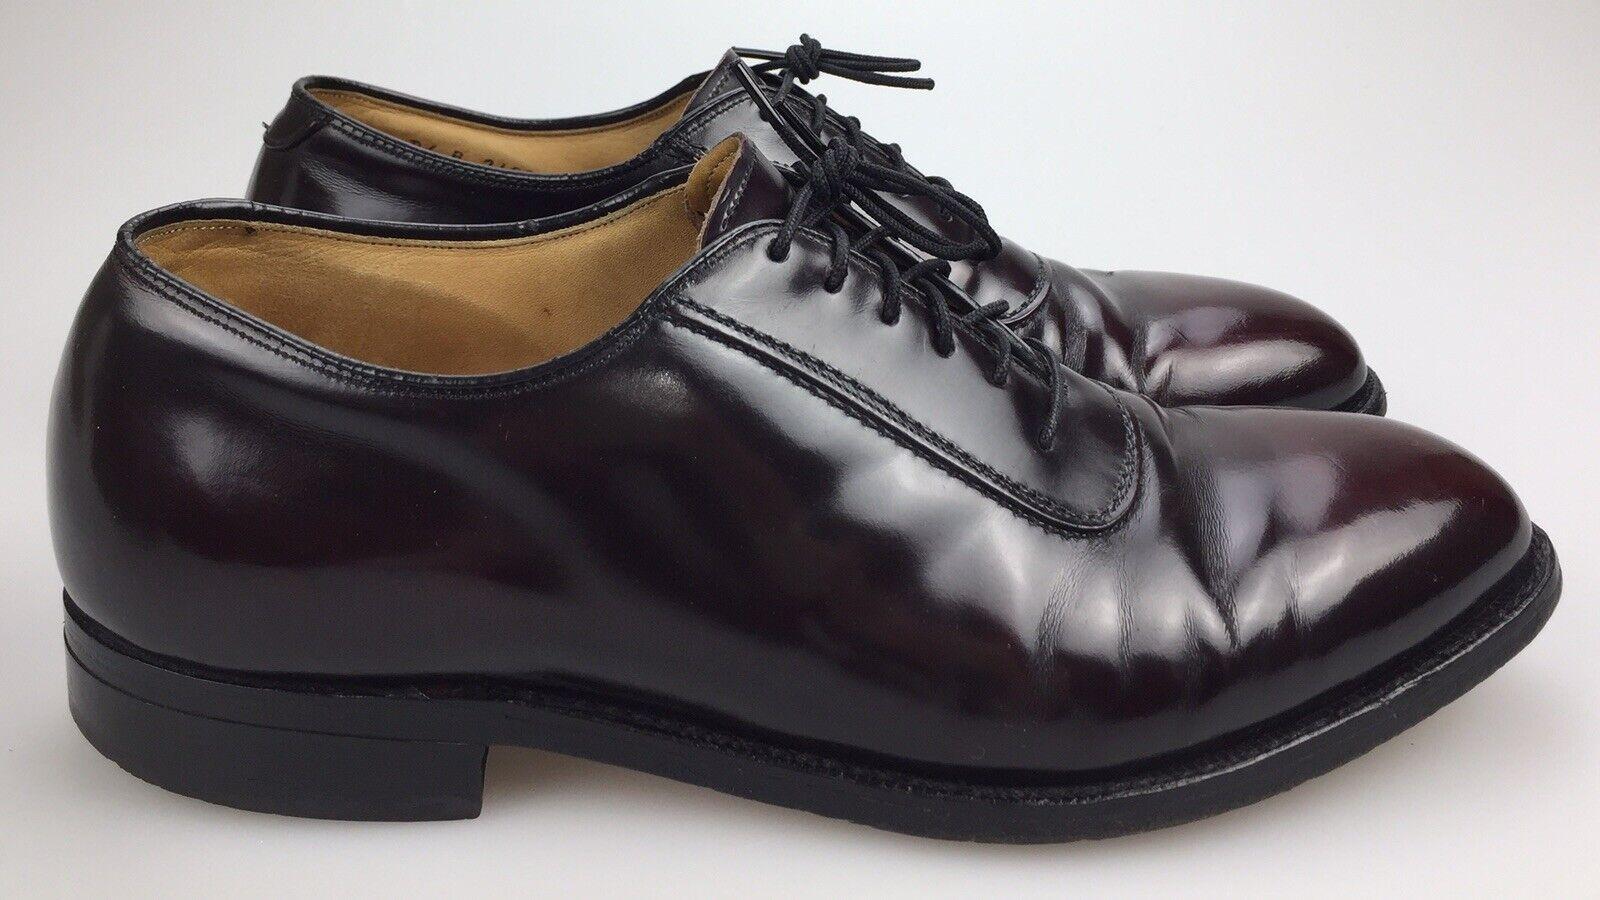 Johnston Murphy Heritage Men's 7.5 Black Cherry Burgundy Leather Lace Up Oxfords